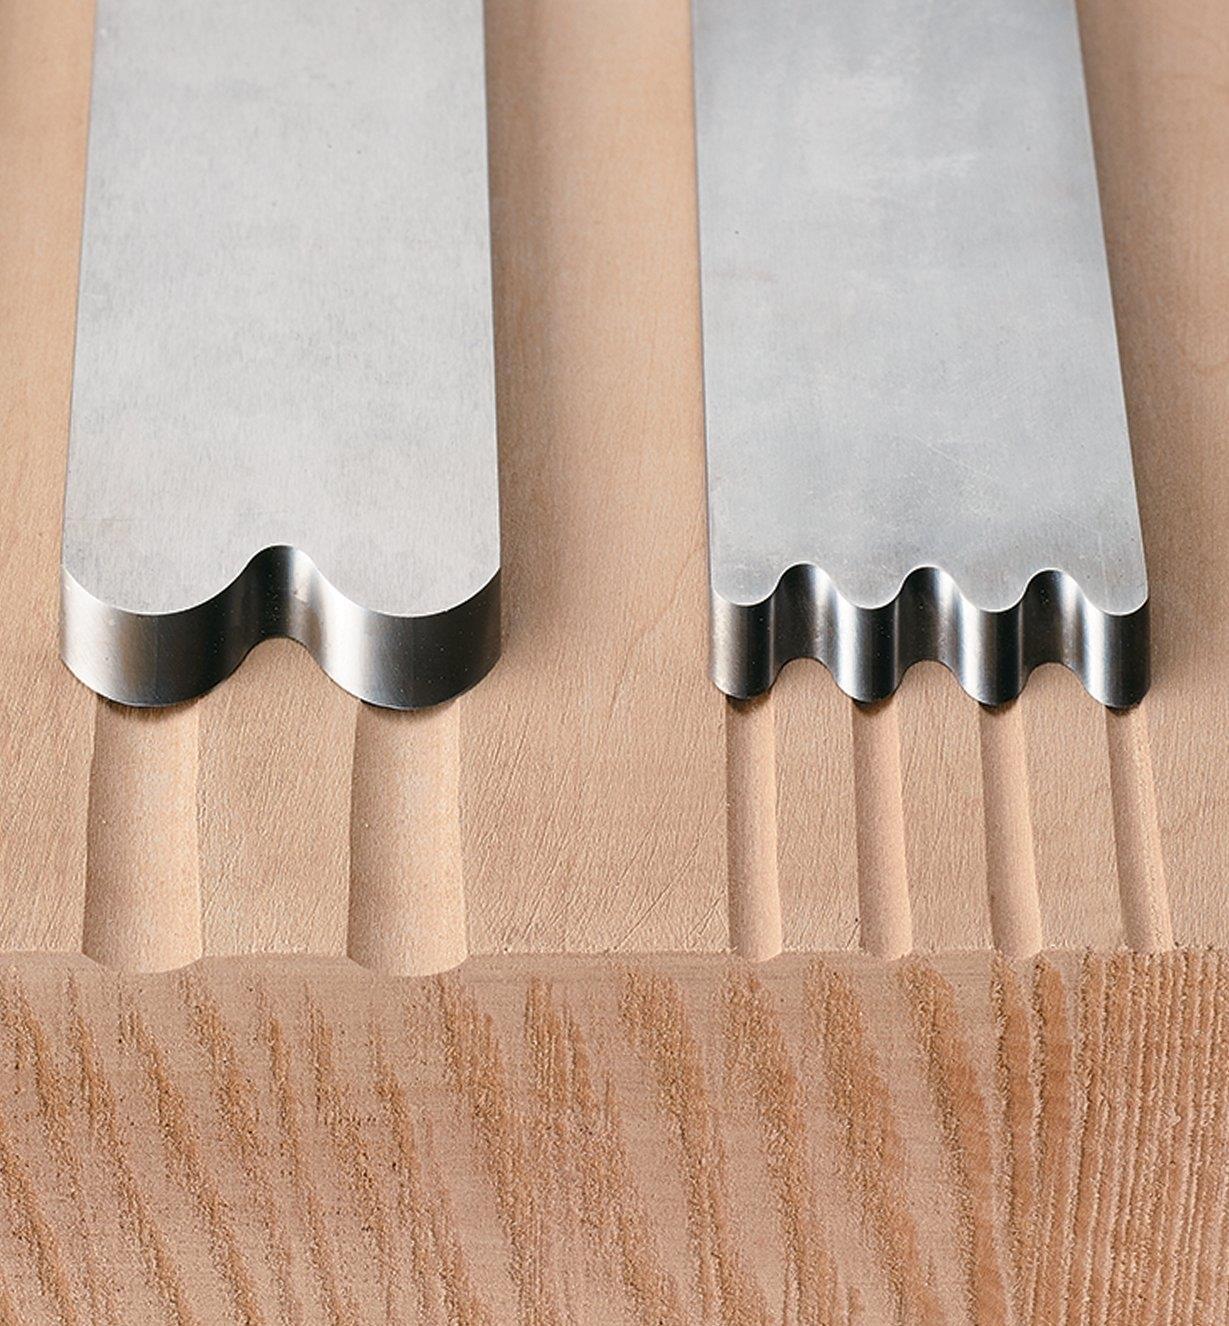 Texturing Blades for Veritas Scrub Plane